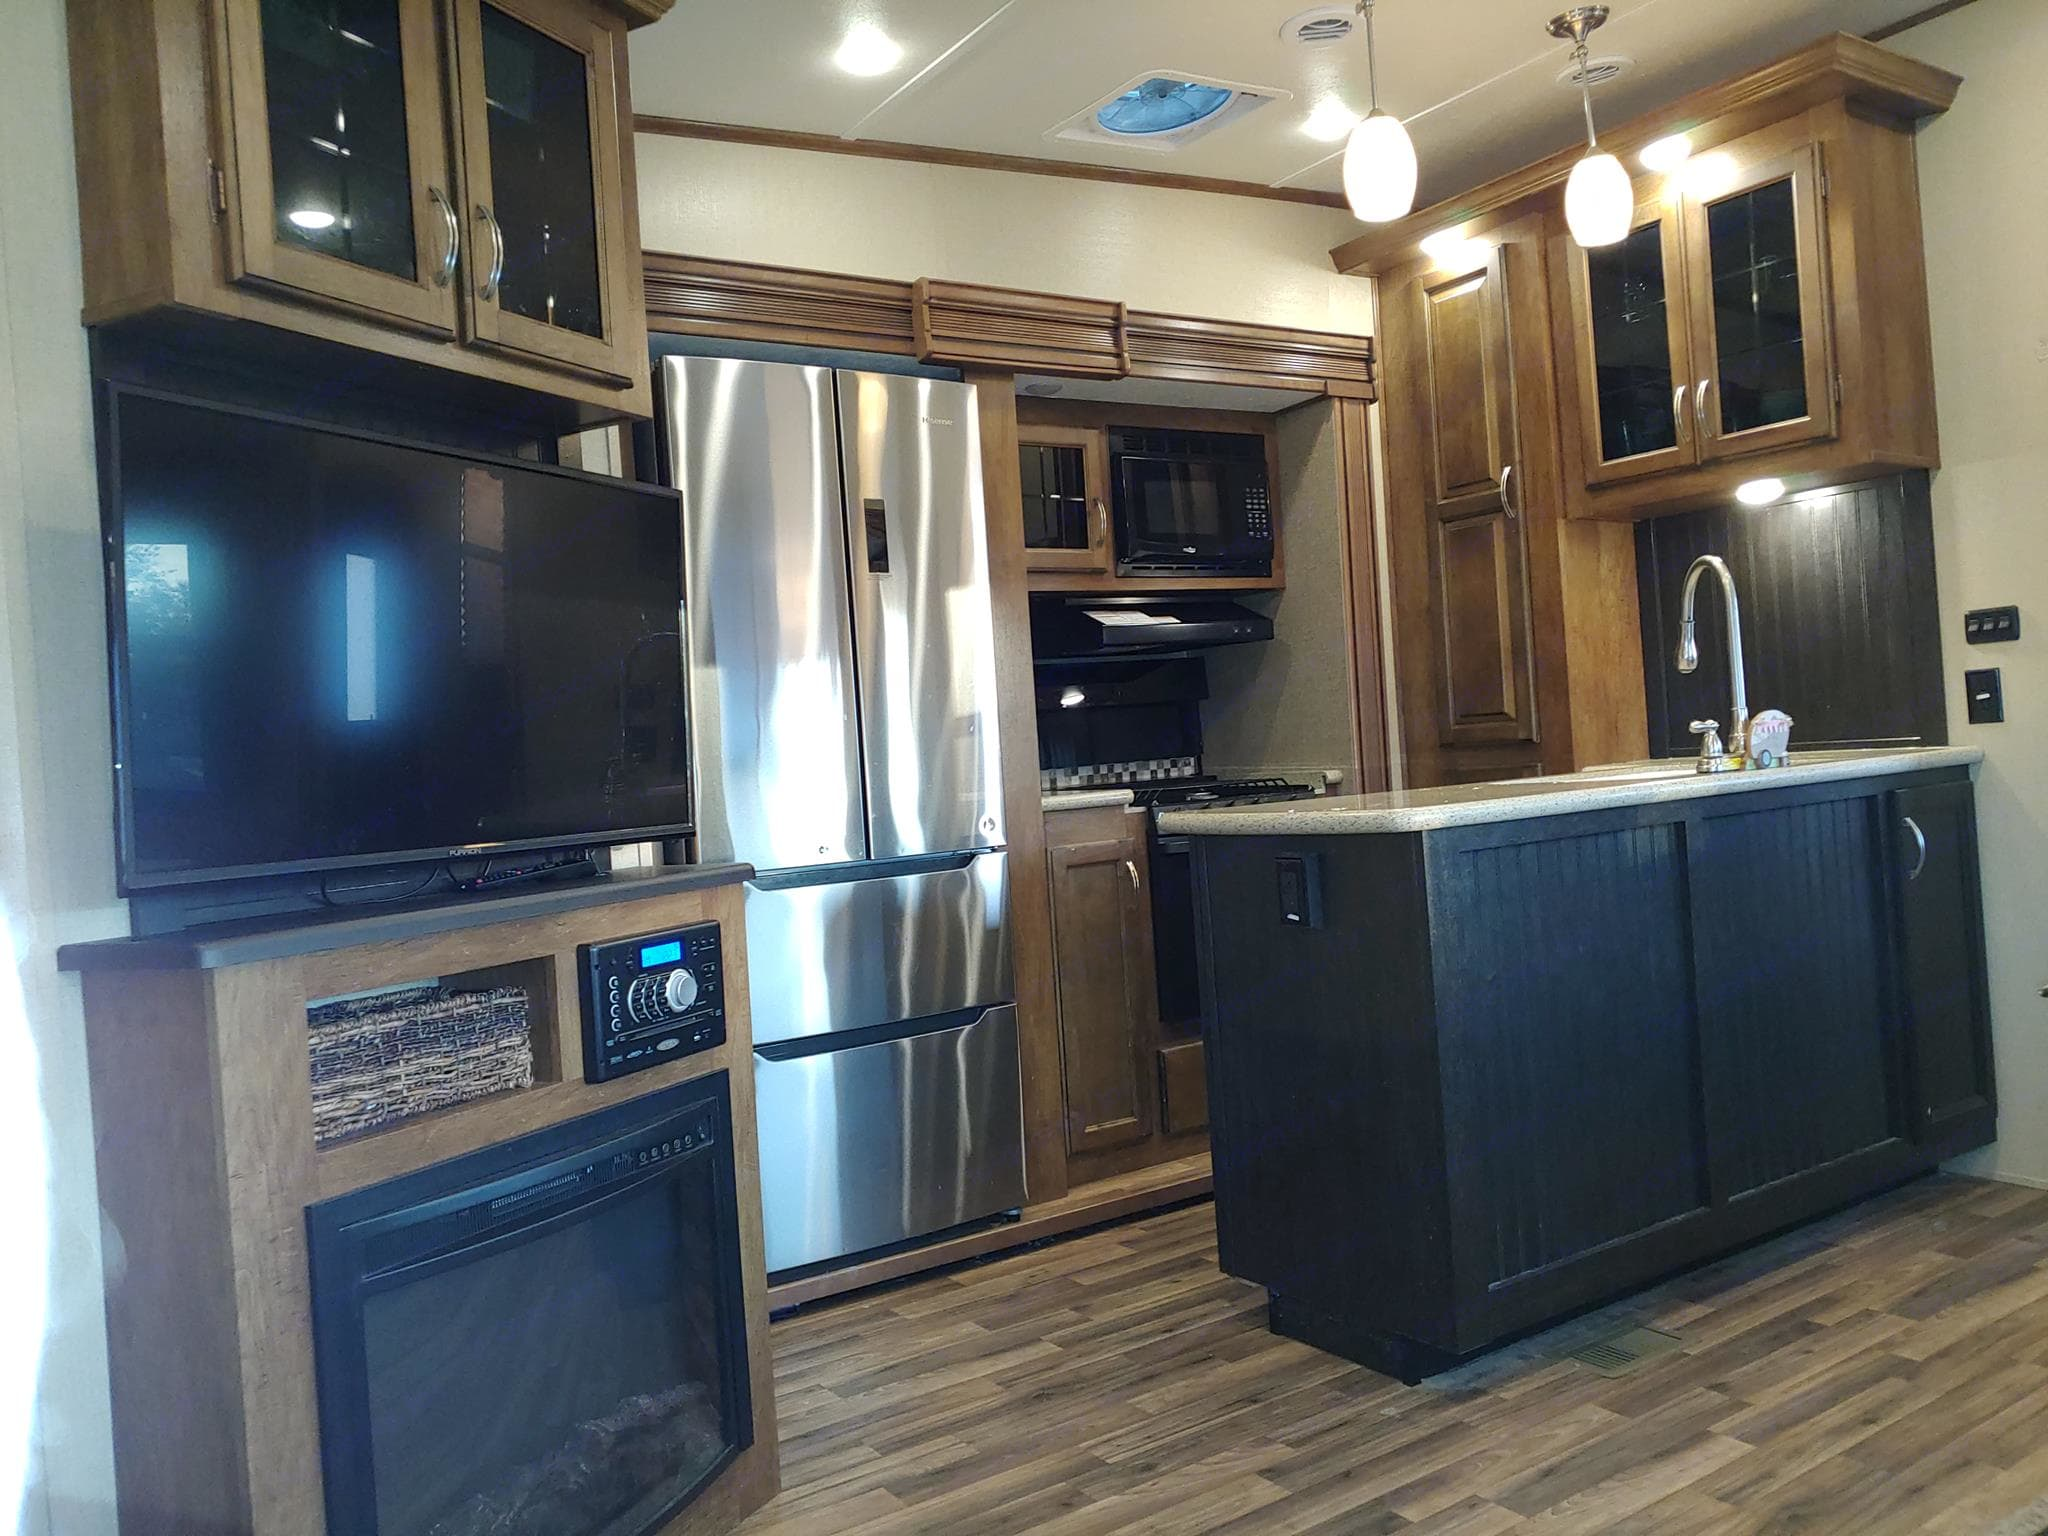 Beautiful kitchen with residential size fridge/freezer, gas stove & cooktop, microwave, double sink, vent/fan, double sink. Coachmen Chaparral 2017